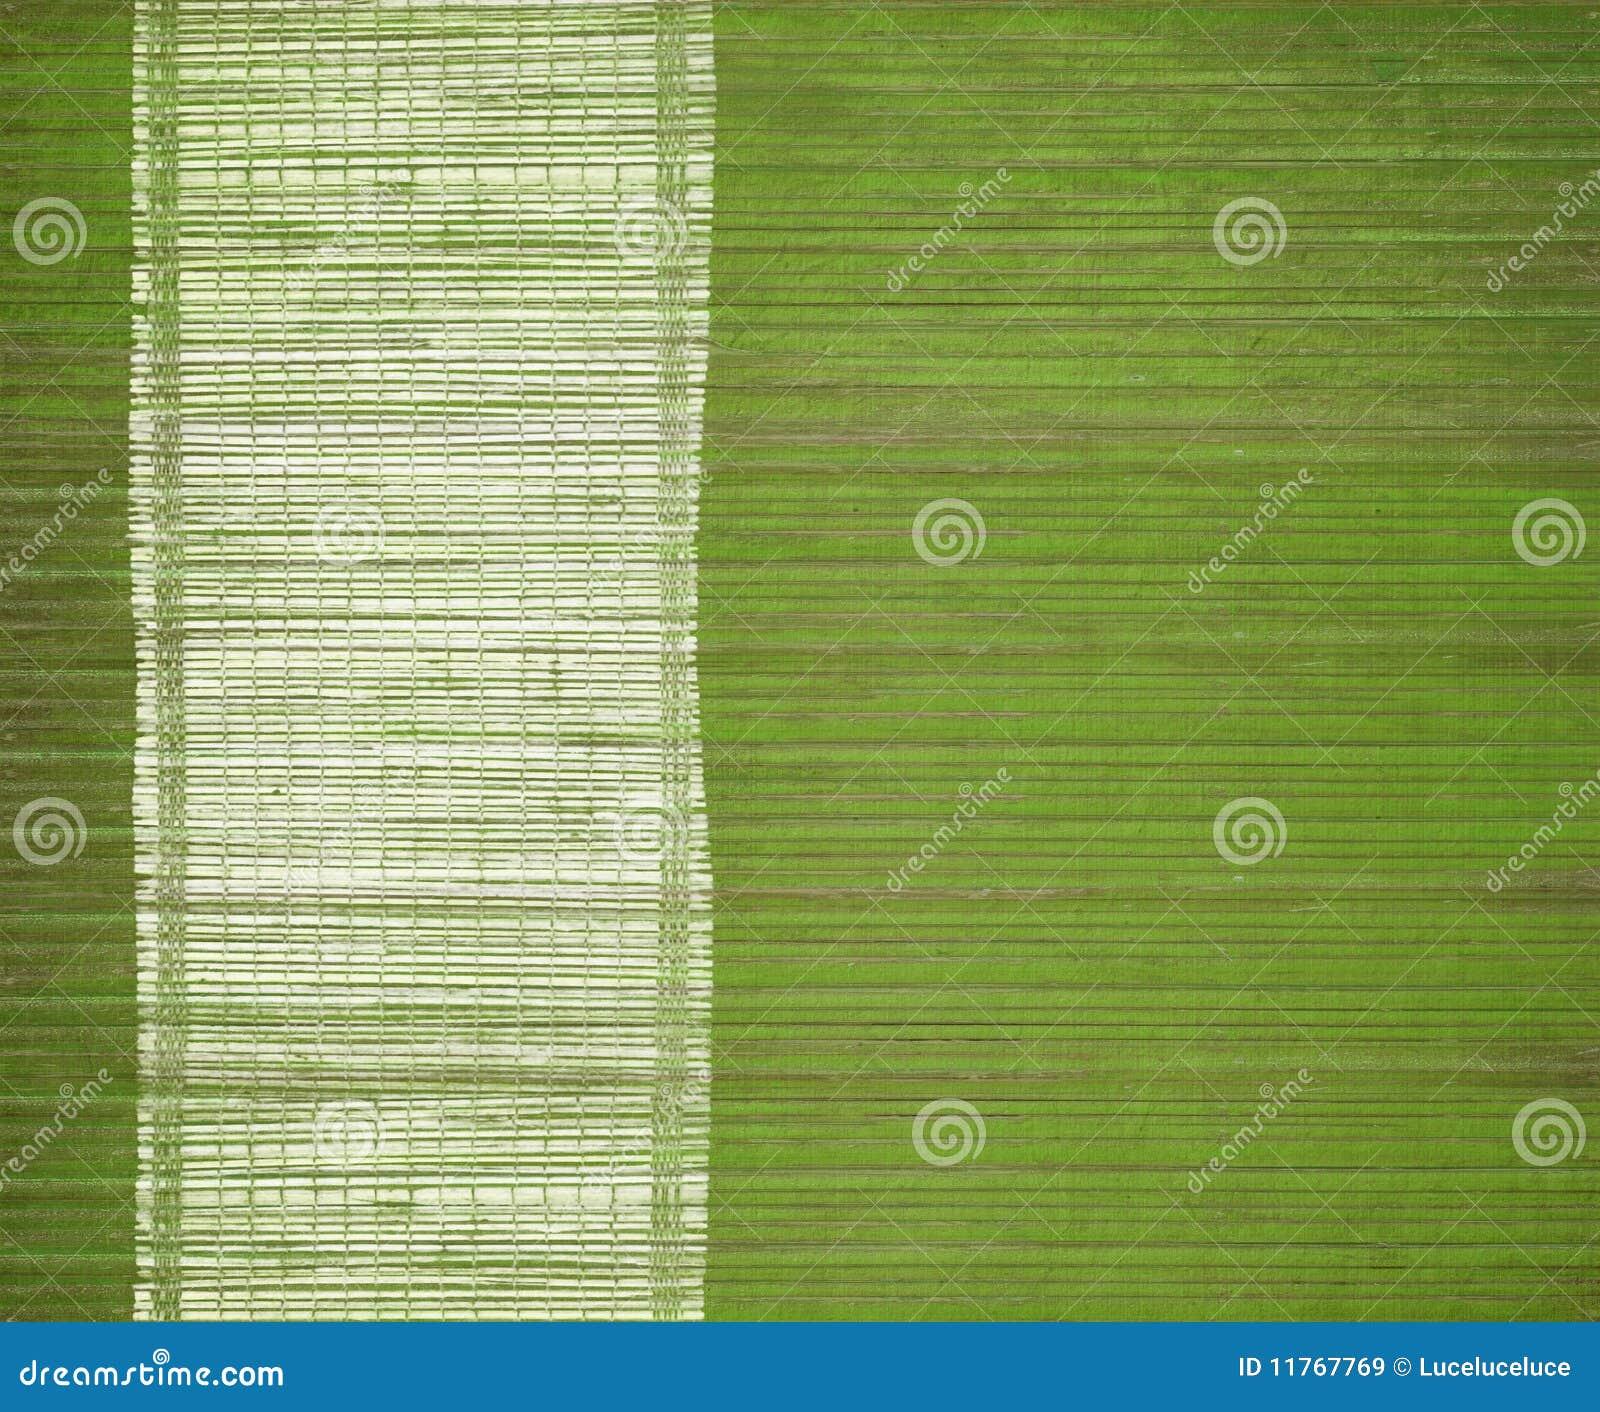 couvre tapis en bambou avec le bar de carte blanc grunge image stock image du abstrait cadre. Black Bedroom Furniture Sets. Home Design Ideas